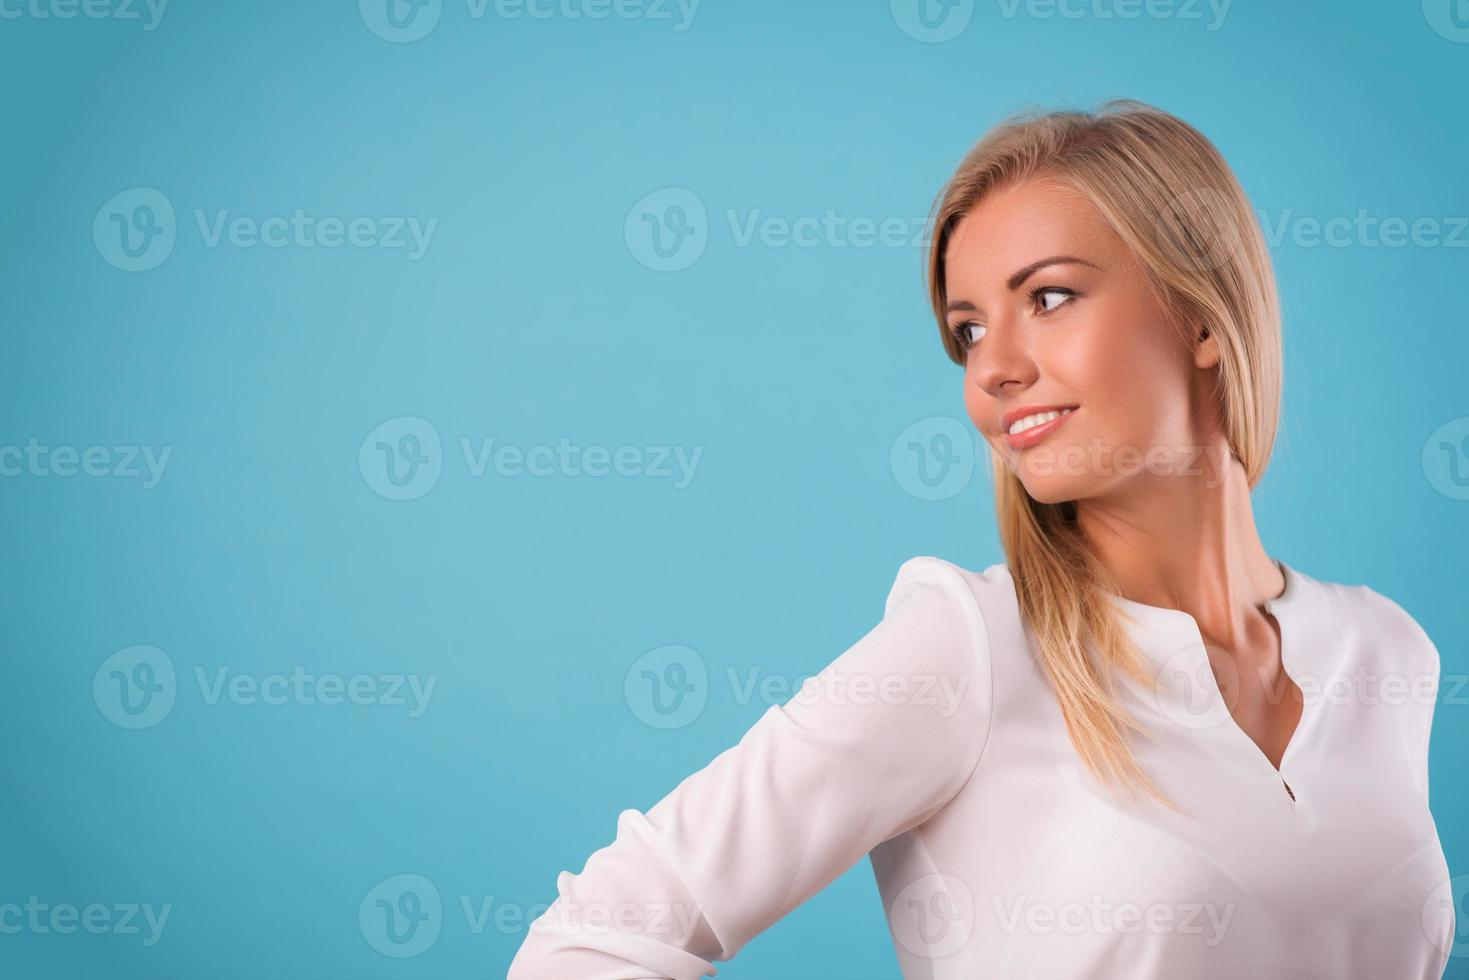 Lovely blonde wearing white blouse photo